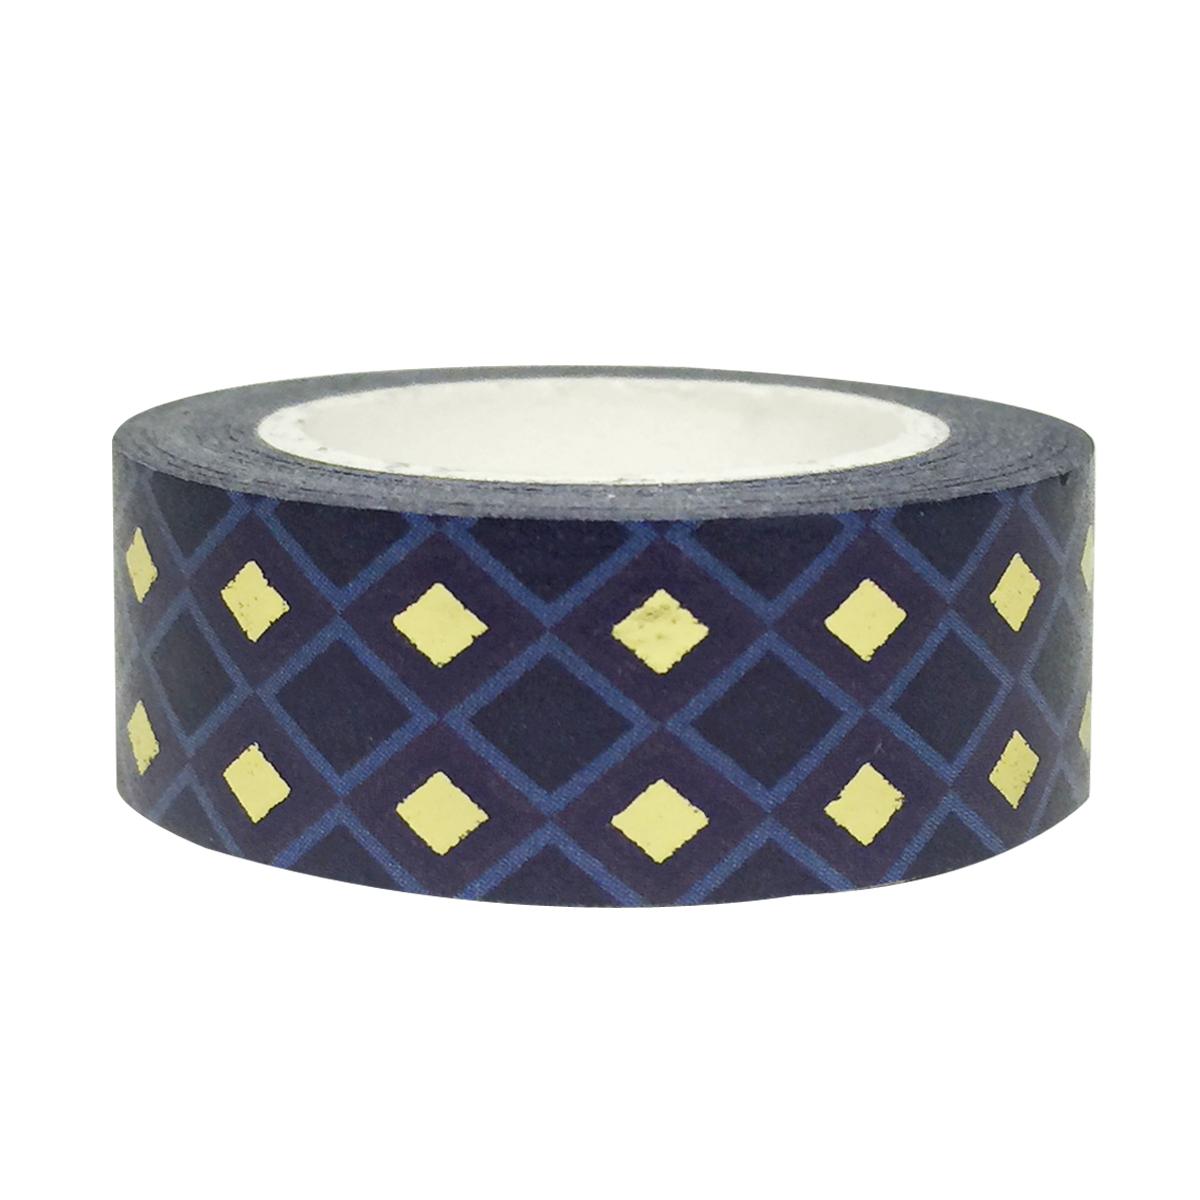 Wrapables® Colorful Washi Masking Tape, Midnight Passion Diamonds